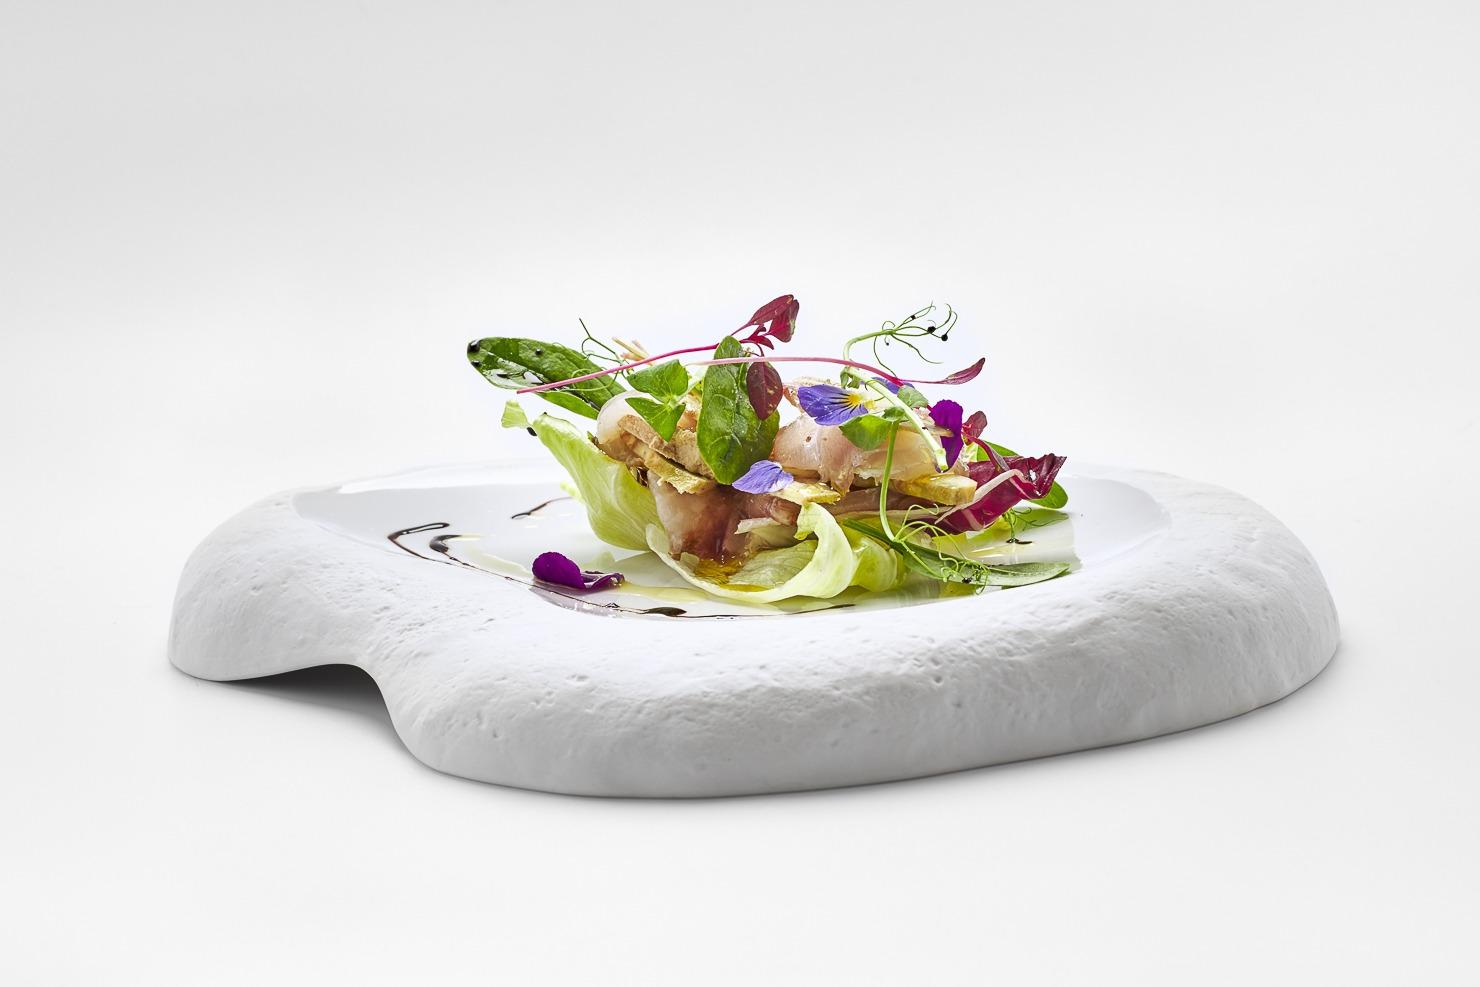 millefoglie-di-spigola-e-fois-gras-con-insalatina-di-carciofi-e-gelée-di-aceto-balsamico